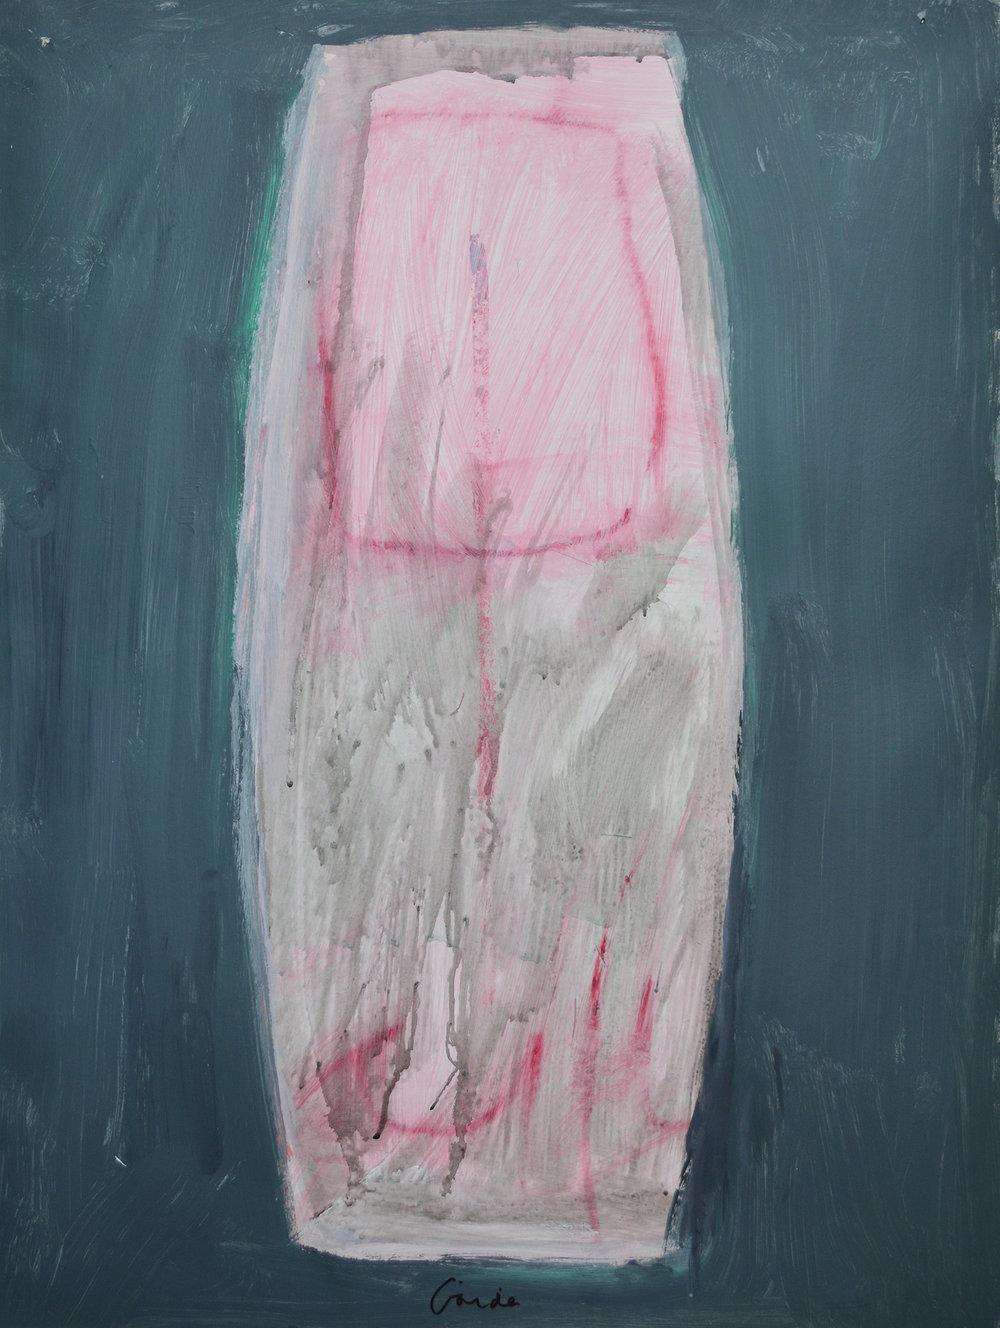 3.3 2004 ME SL IMG-296. Pink Vessel. 2004. 30x22. Acrylic on Paper. Still Life